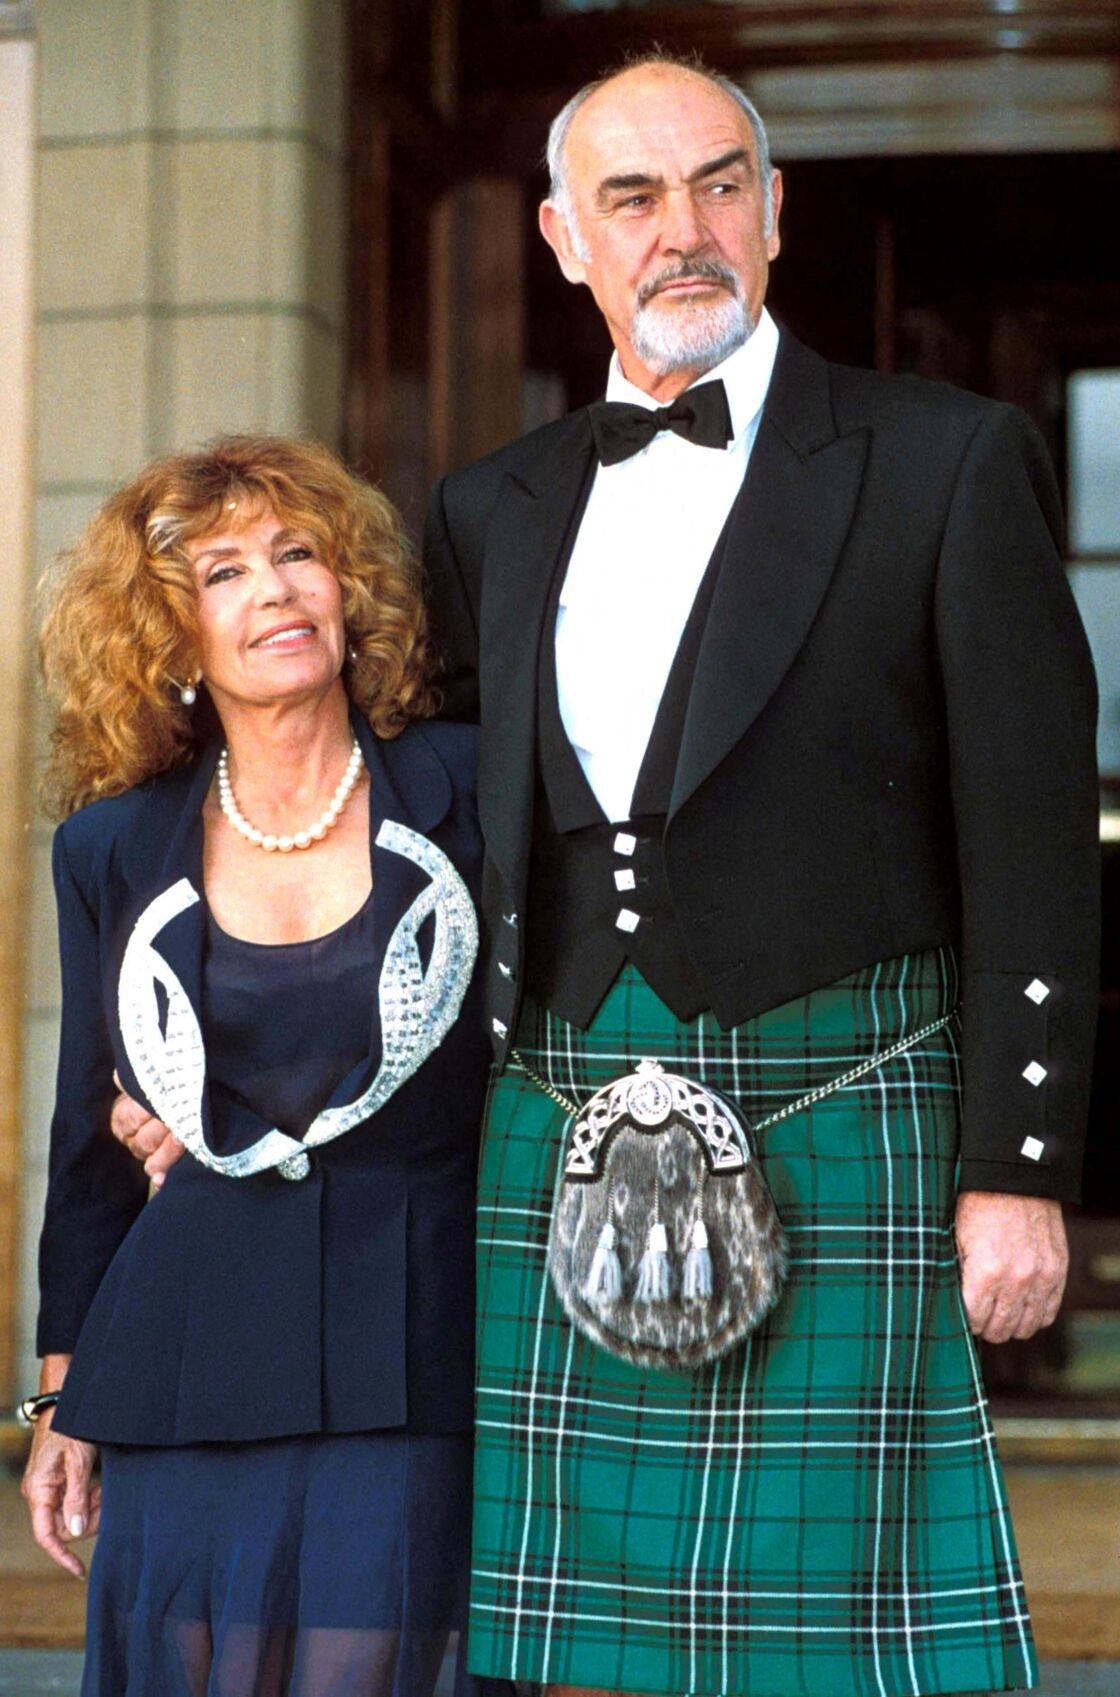 Sean Connery et sa compagne Micheline Roquebrune